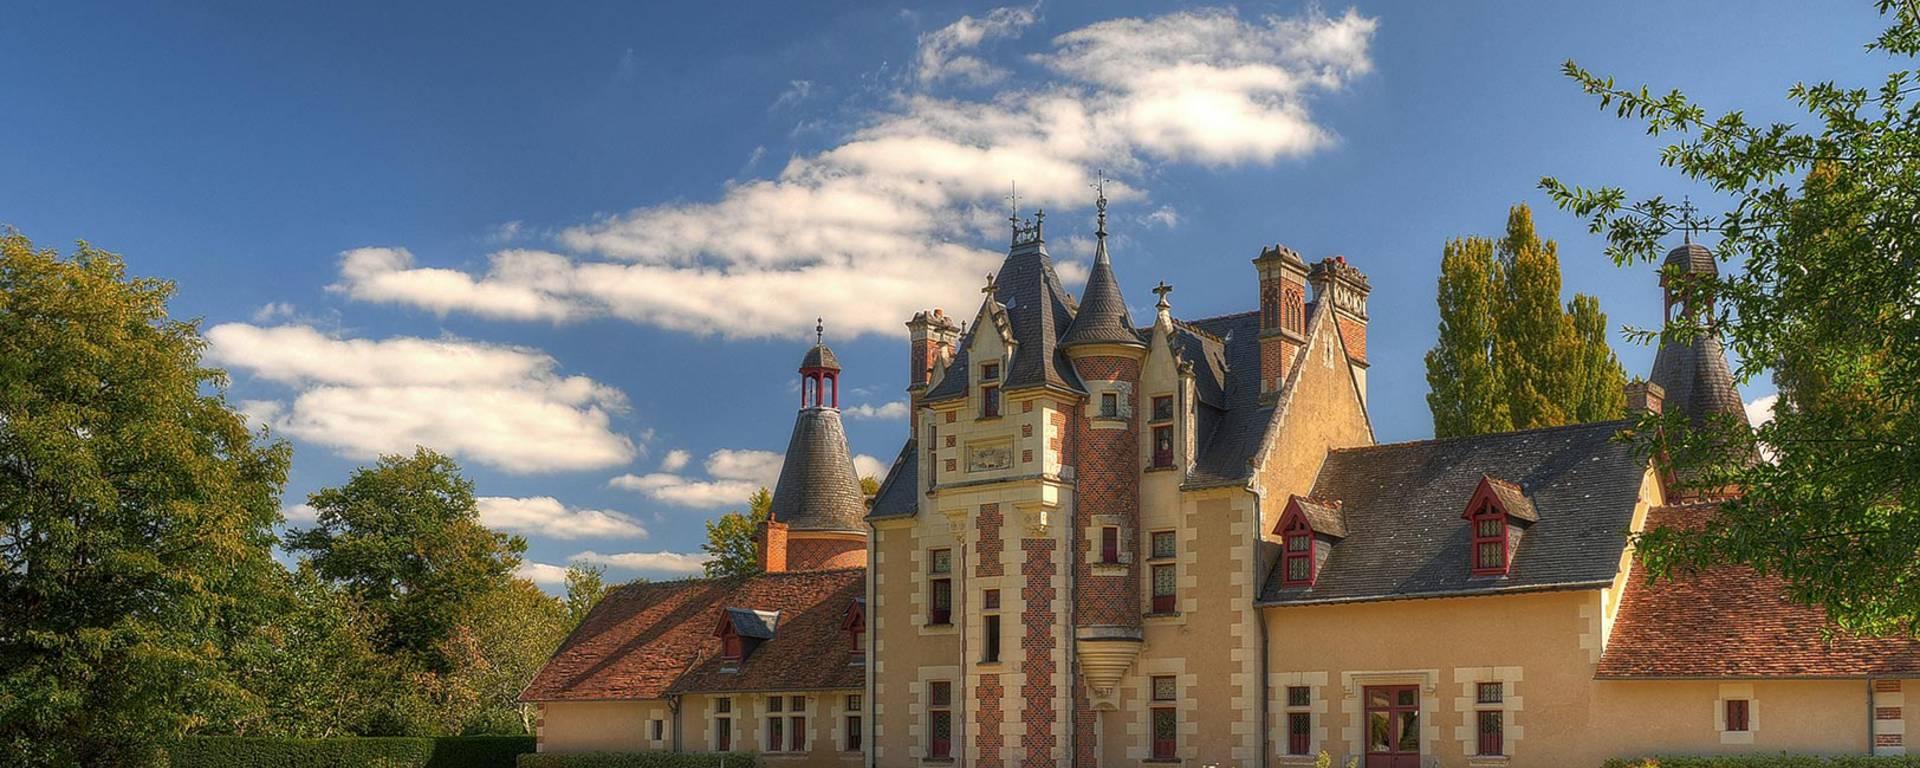 The façade of the Château de Troussay